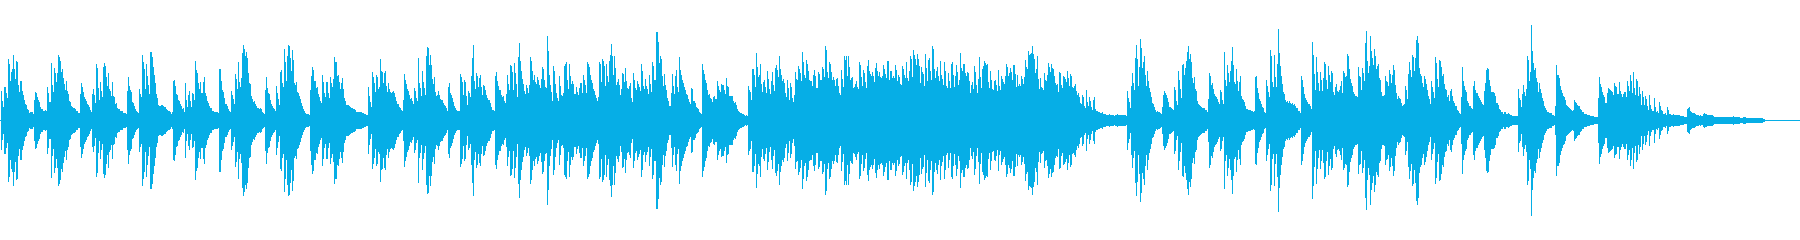 StockMusic32_PianoSamplerの再生済みの波形